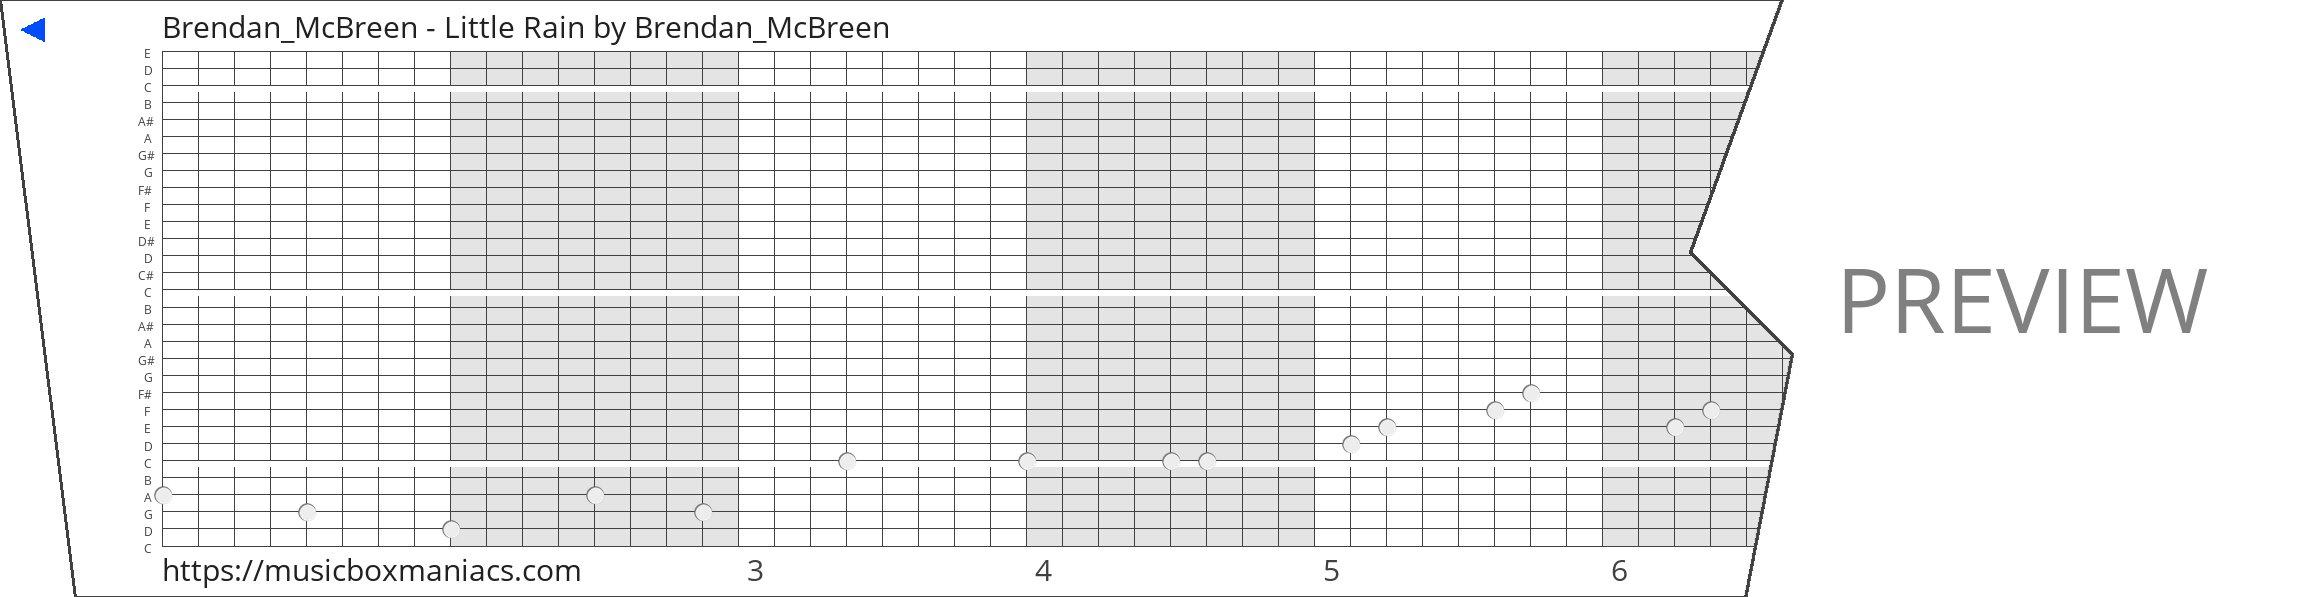 Brendan_McBreen - Little Rain 30 note music box paper strip